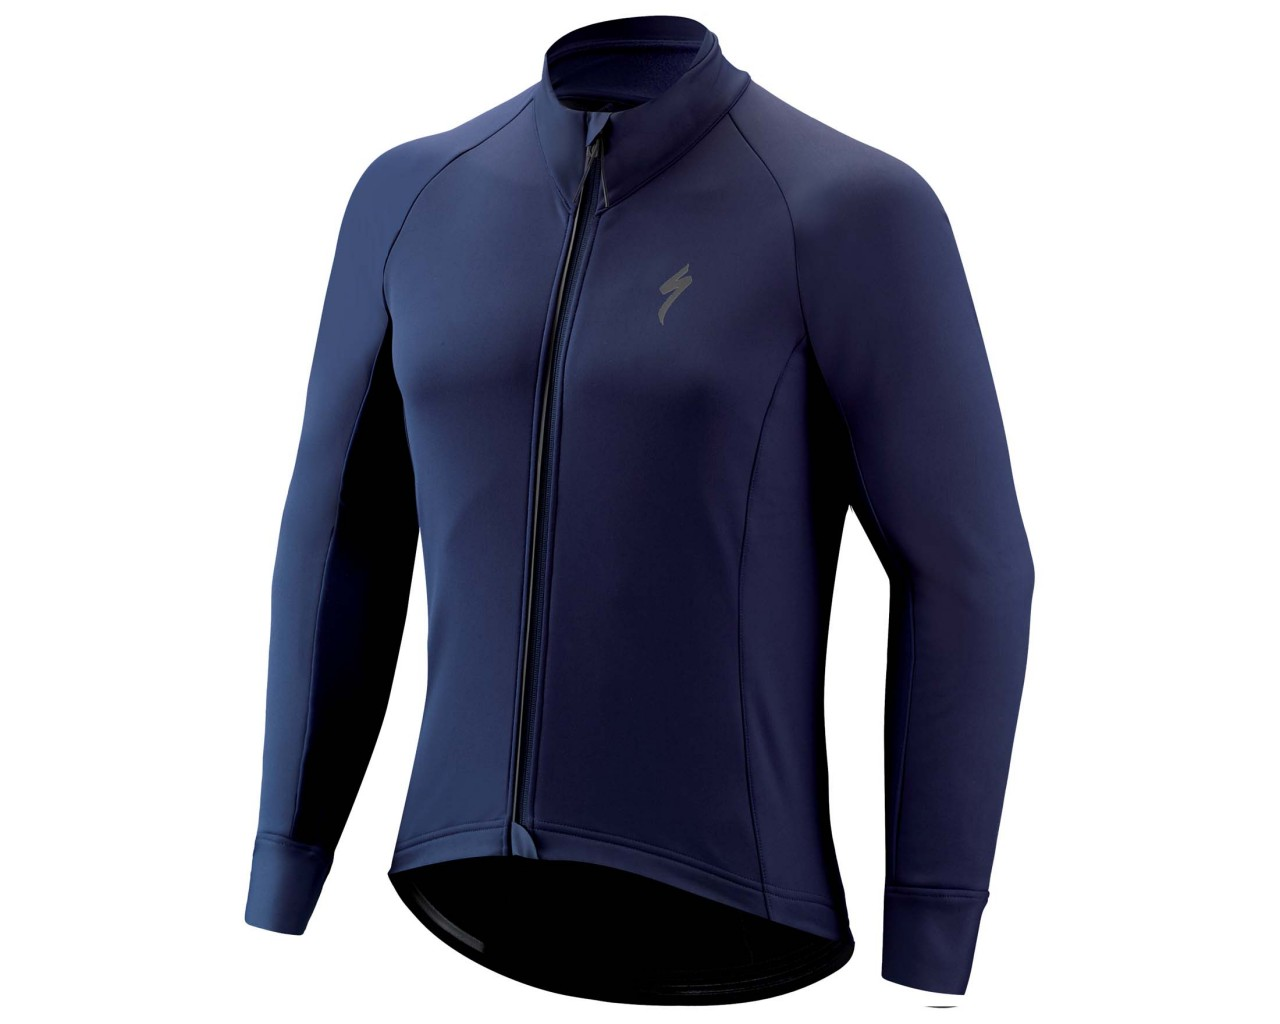 Specialized Element RBX Pro Jacket | navy blue